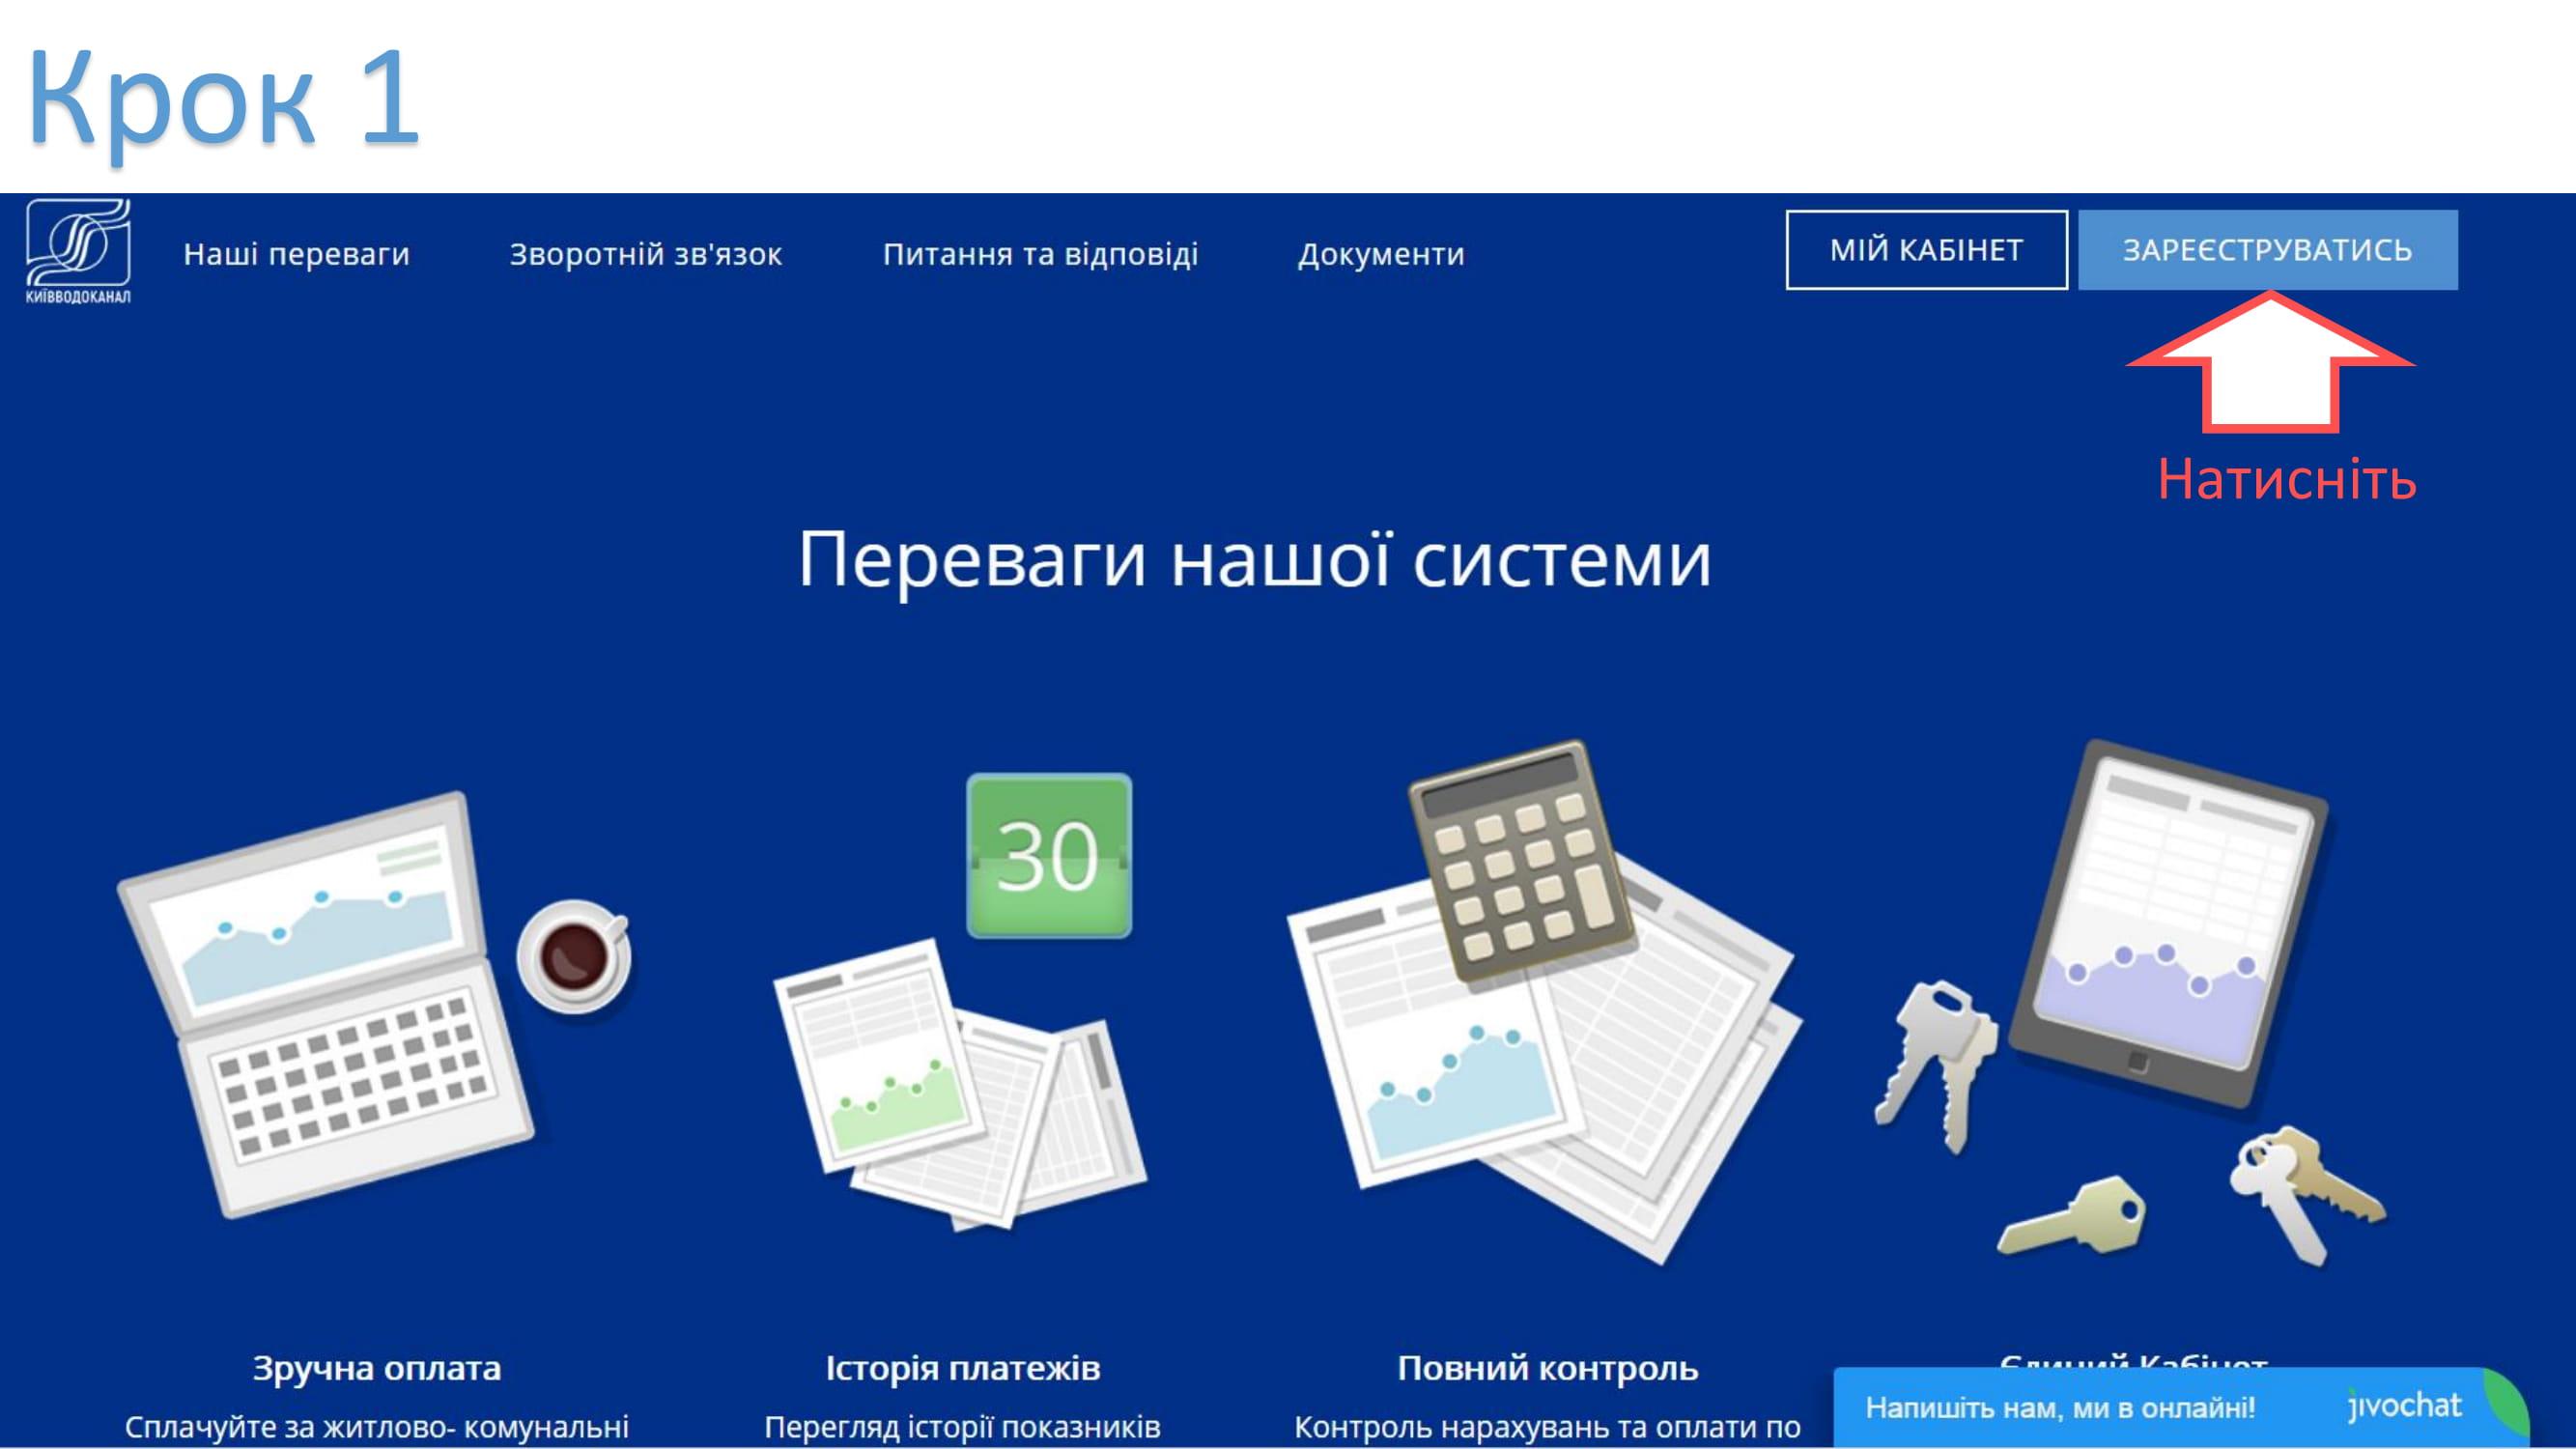 kievvodokanal lichnyj kabinet kak zaregistrirovatsya - Киевводоканал. Инструкция по регистрации в личном кабинете